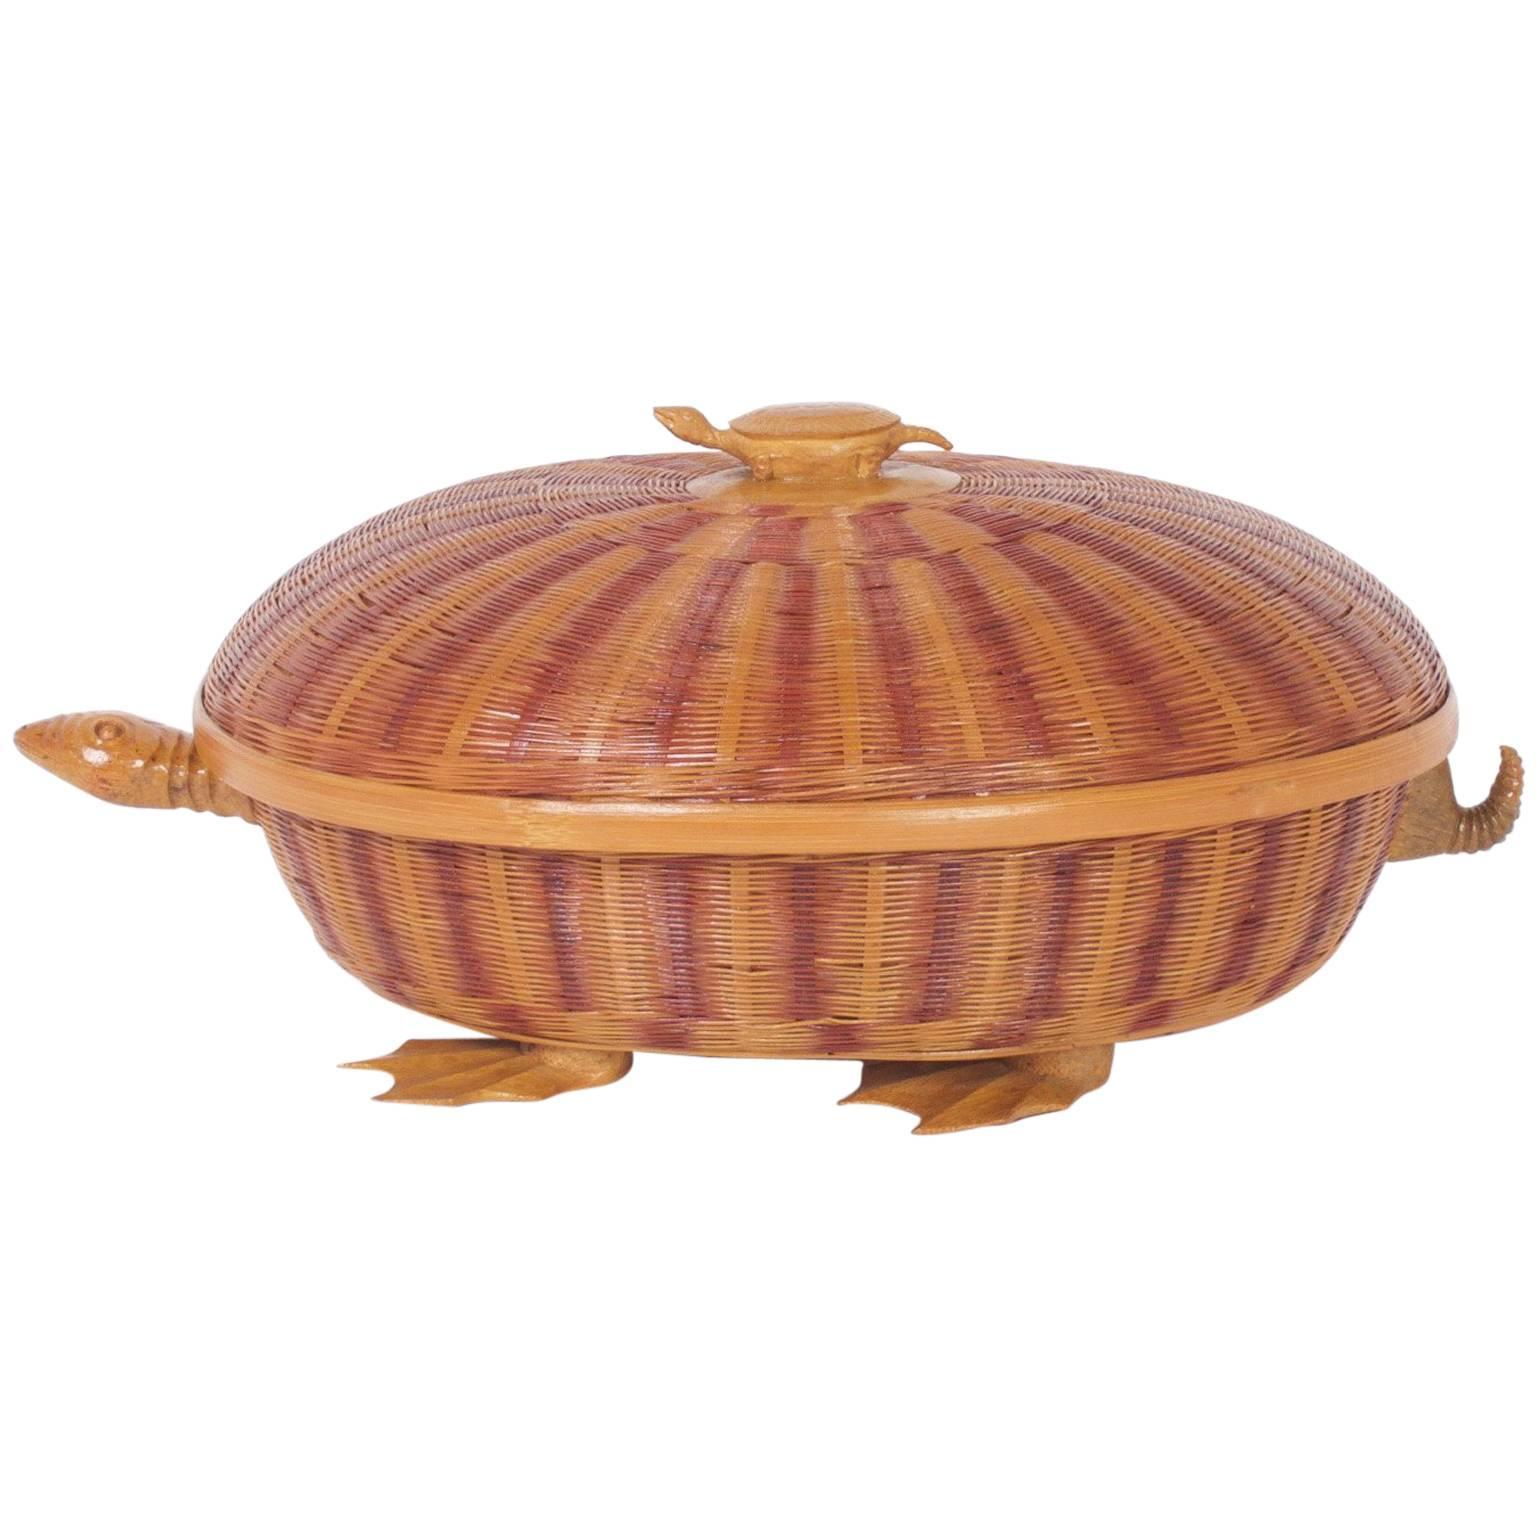 Amusing Mid-Century Wicker Turtle Box